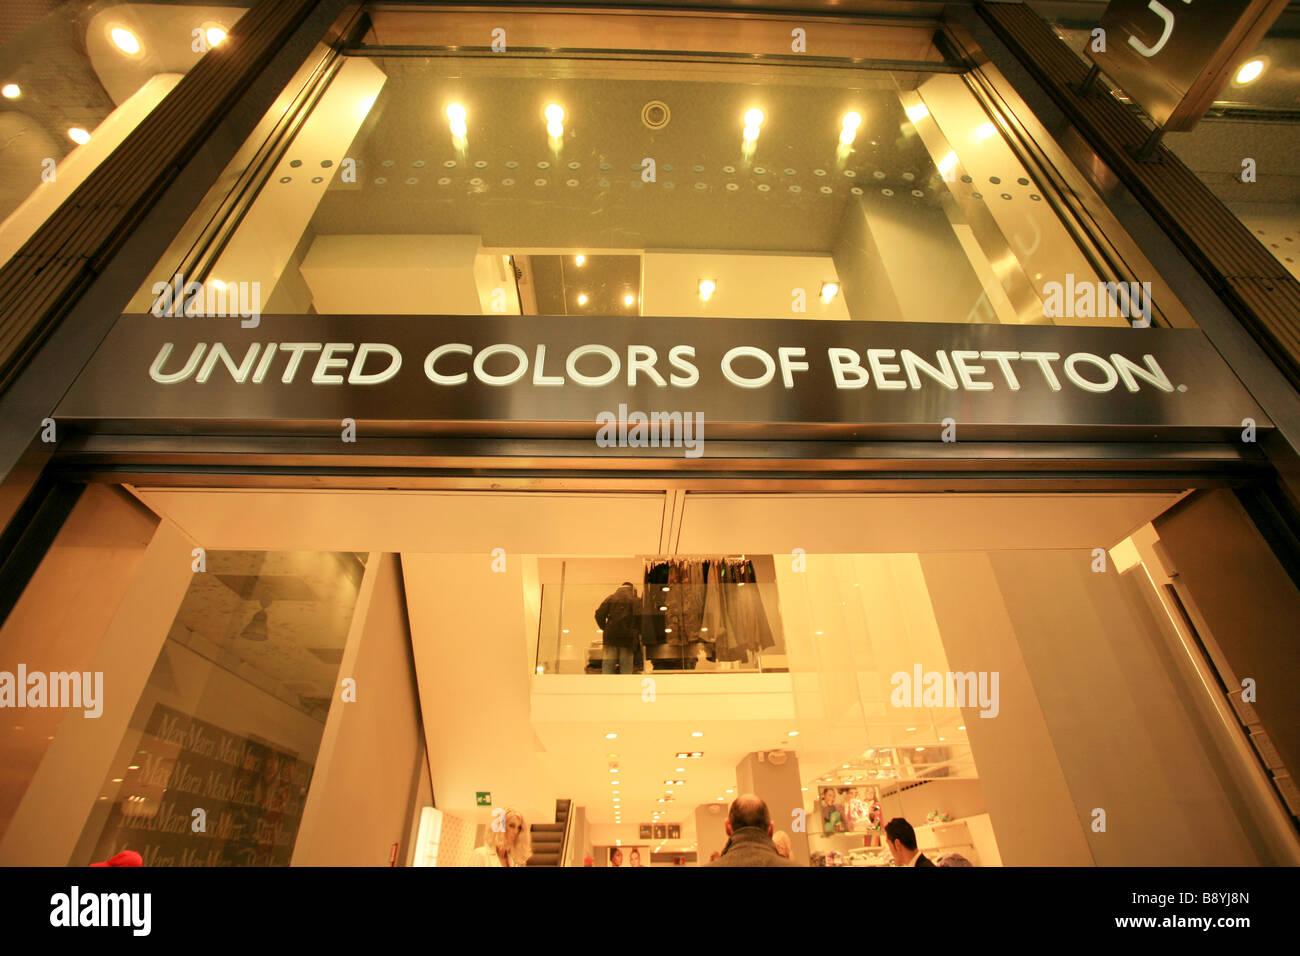 United Colors of Benetton shop, Vittorio Emanuele II street, Milan, Lombardy, Italy - Stock Image